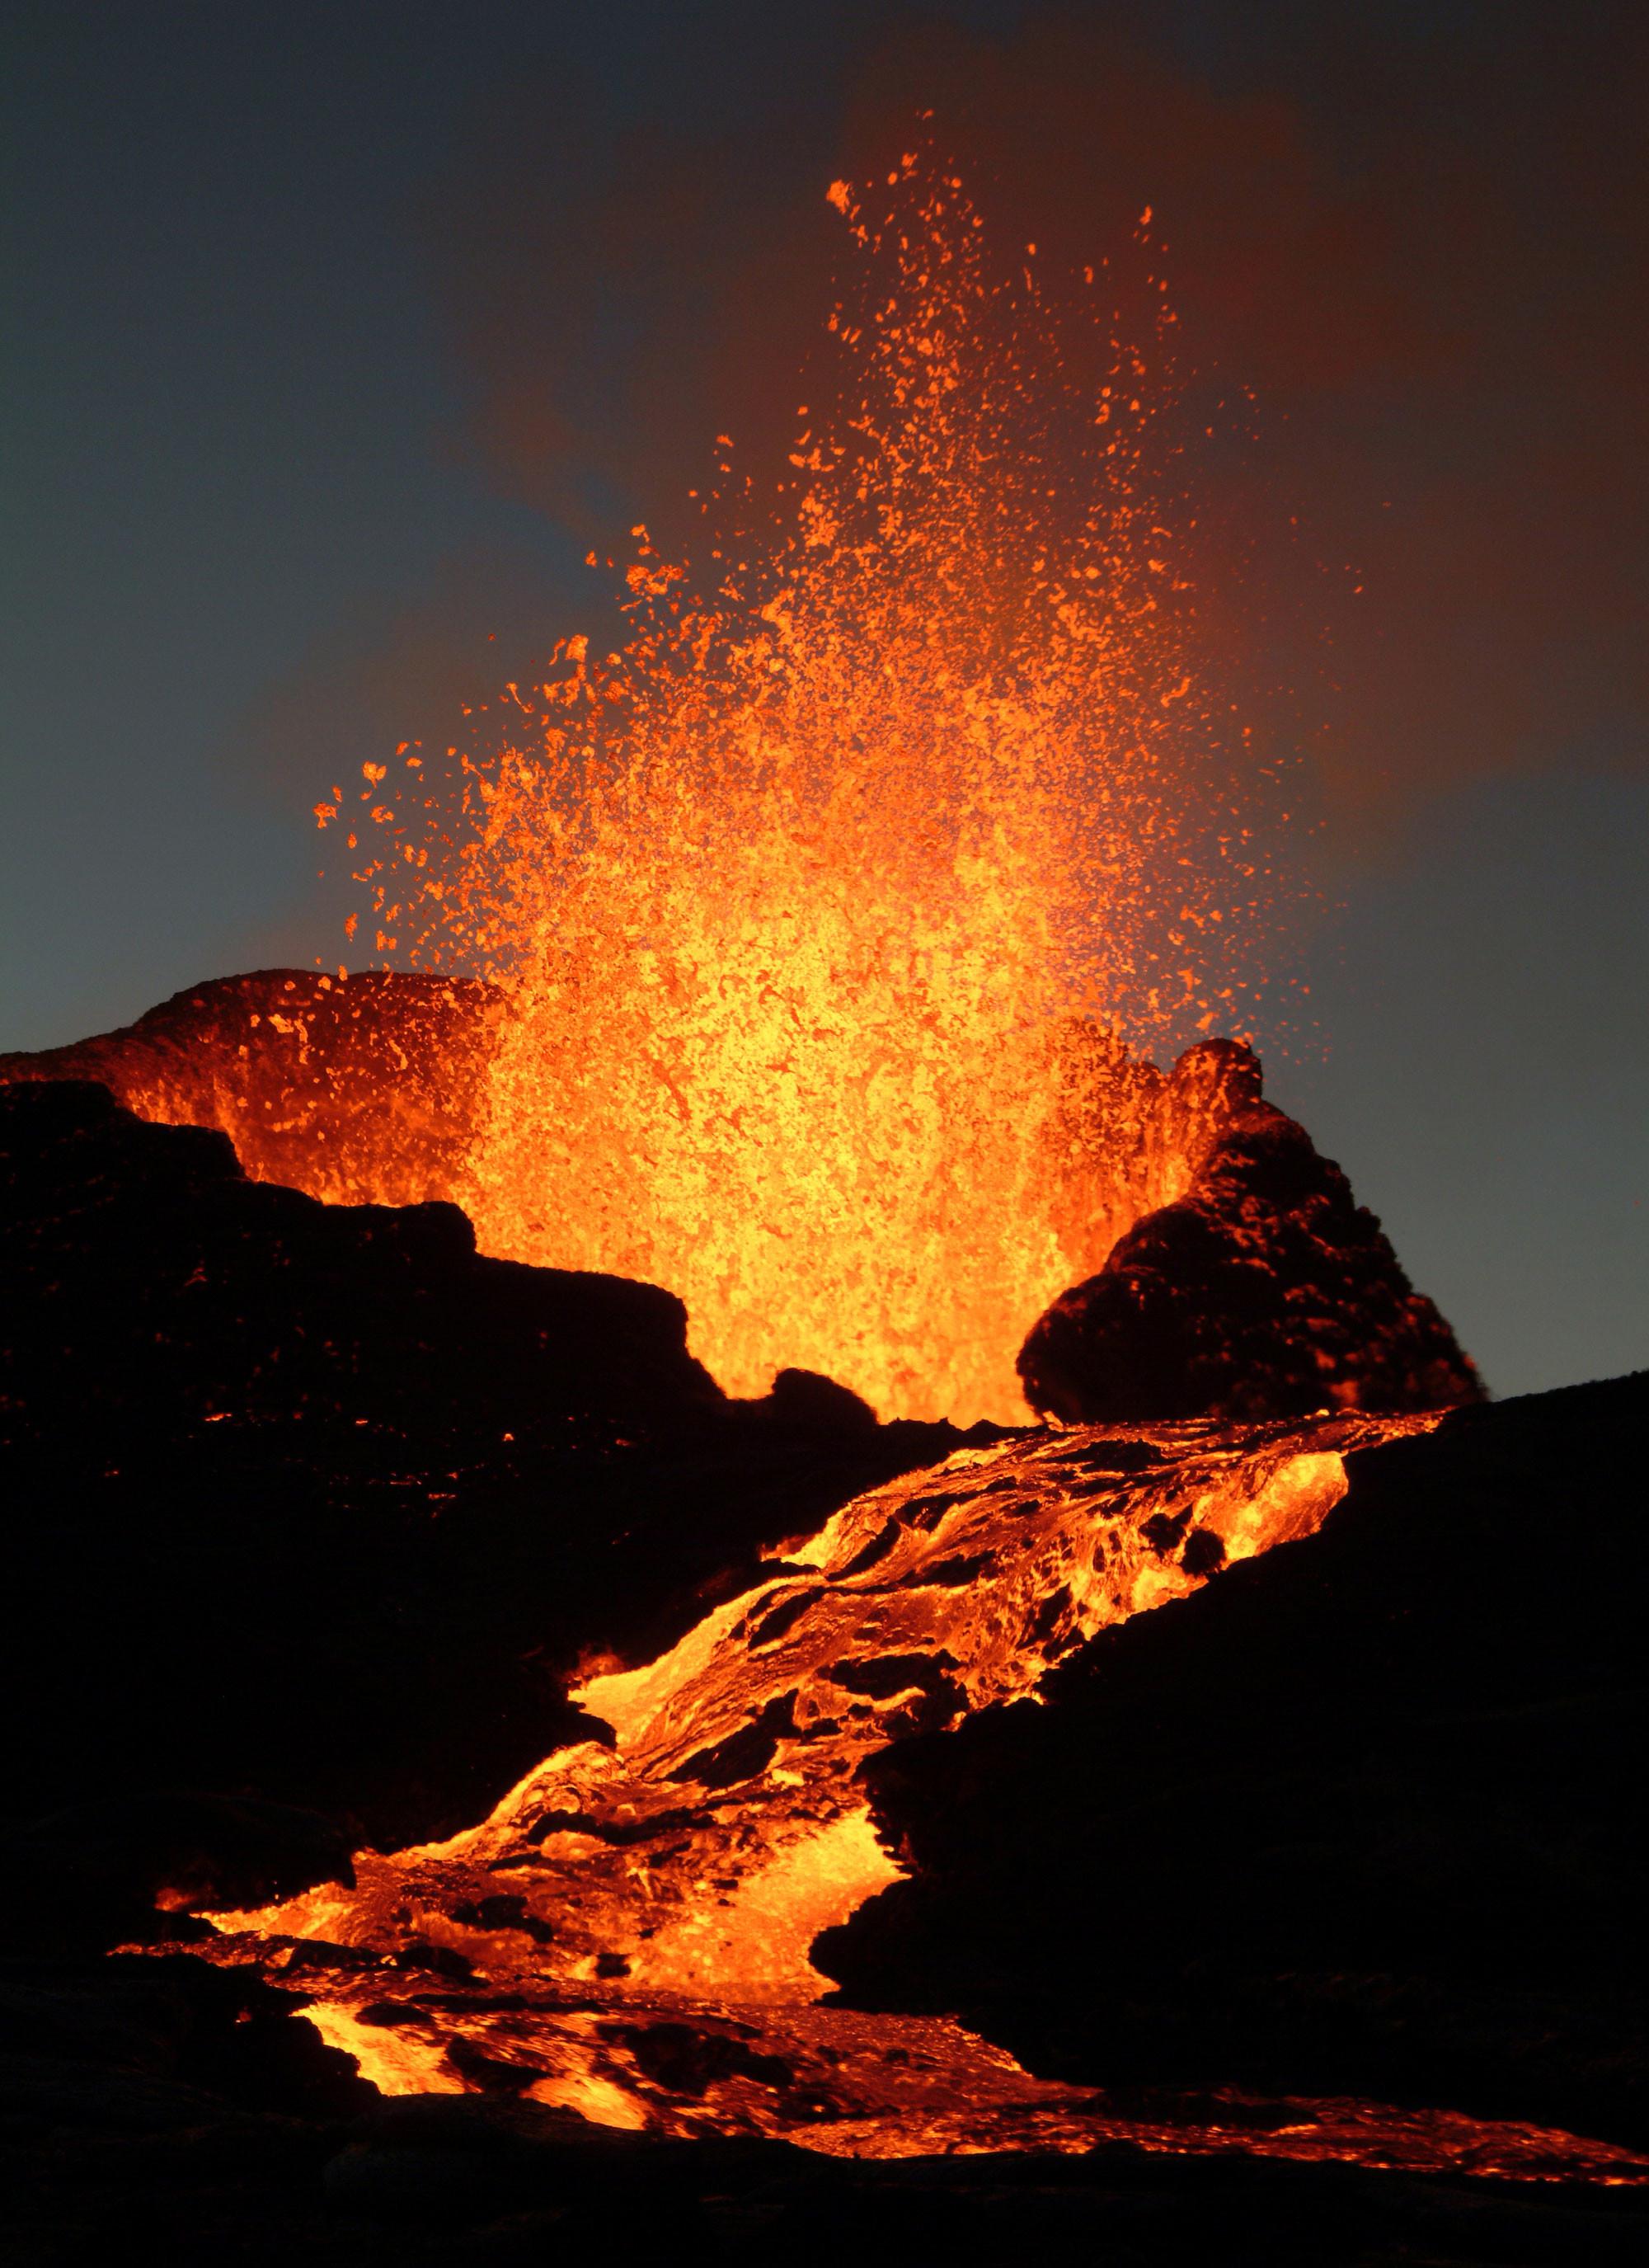 86 best Erupting Volcanoes images on Pinterest   Volcanoes, Erupting volcano  and Lava